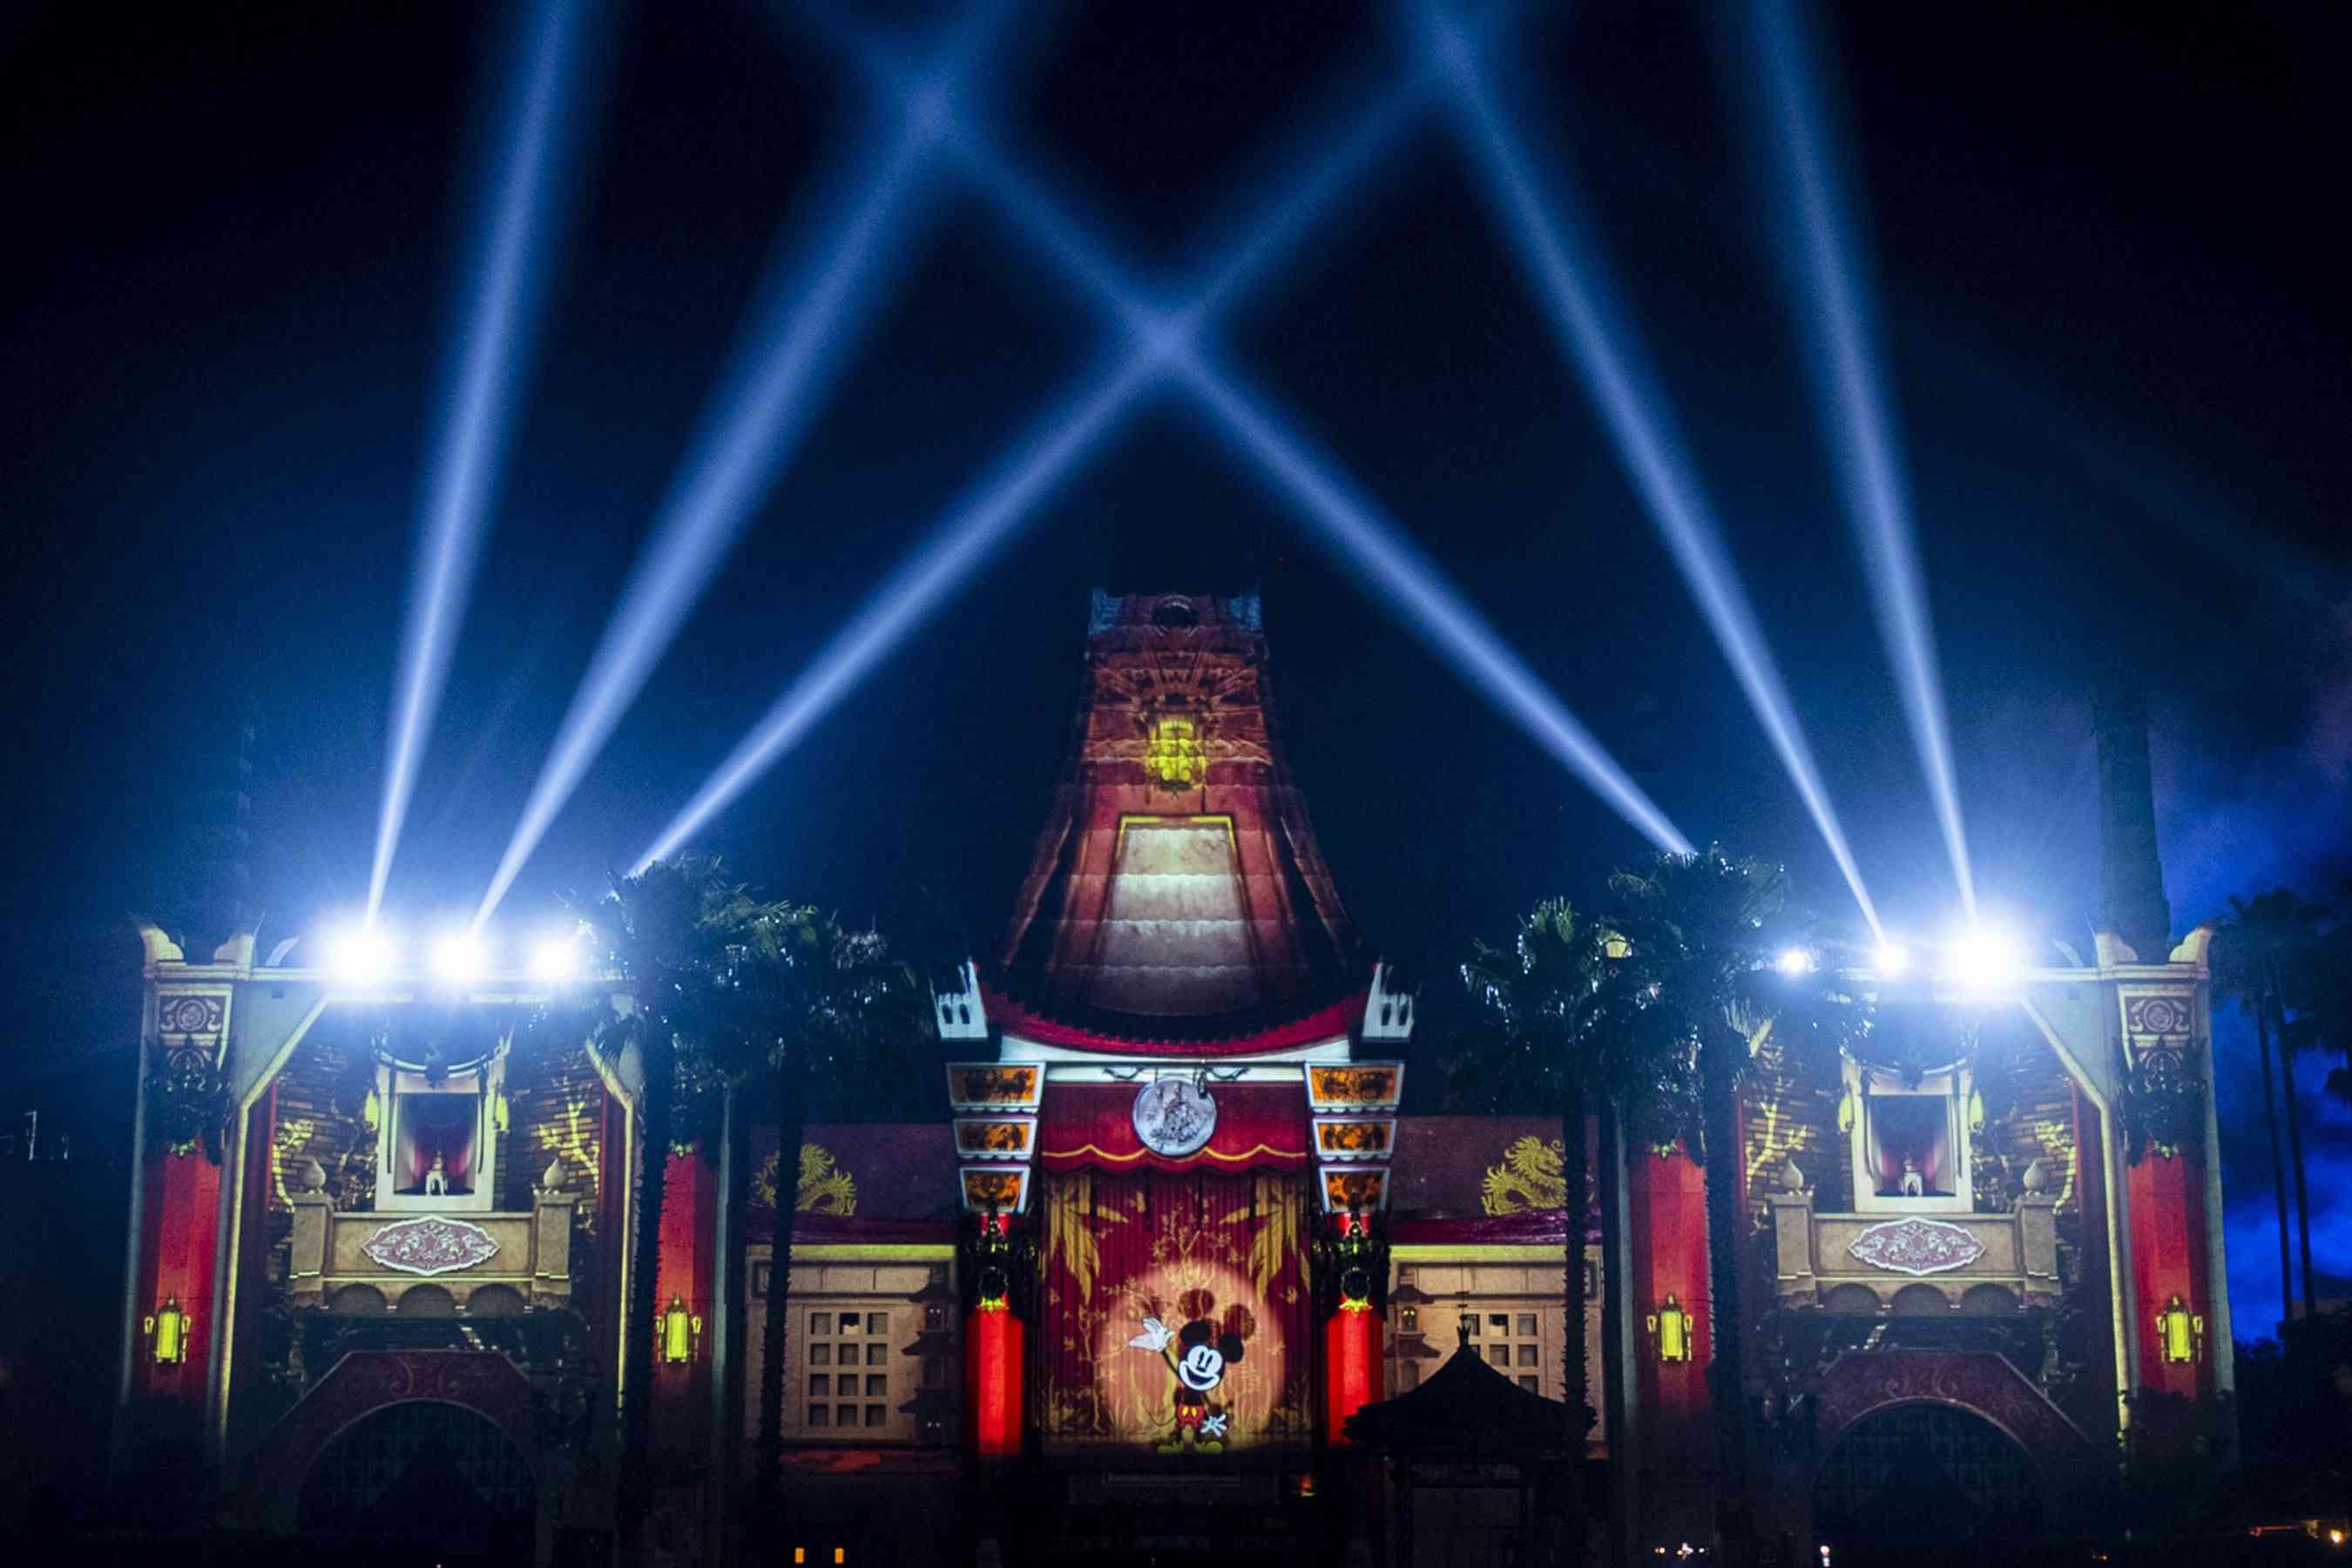 Nighttime Shows at Disney's Hollywood Studios